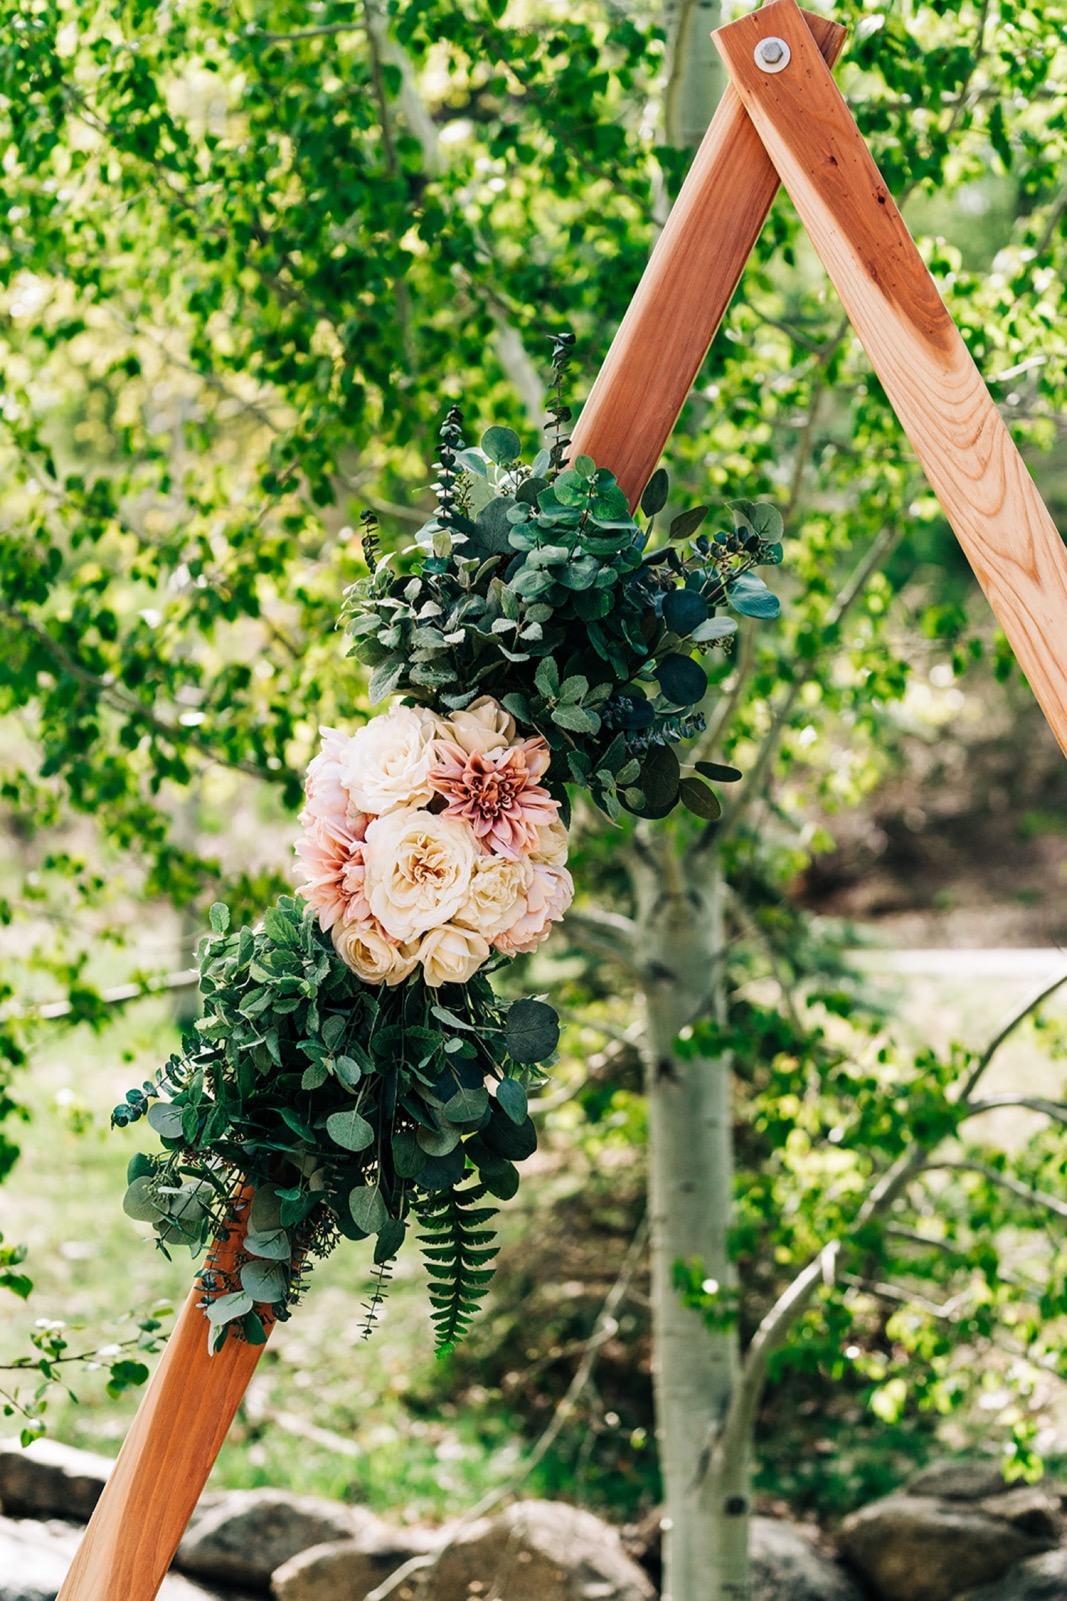 050_falissa_heather_wedding-125.jpg